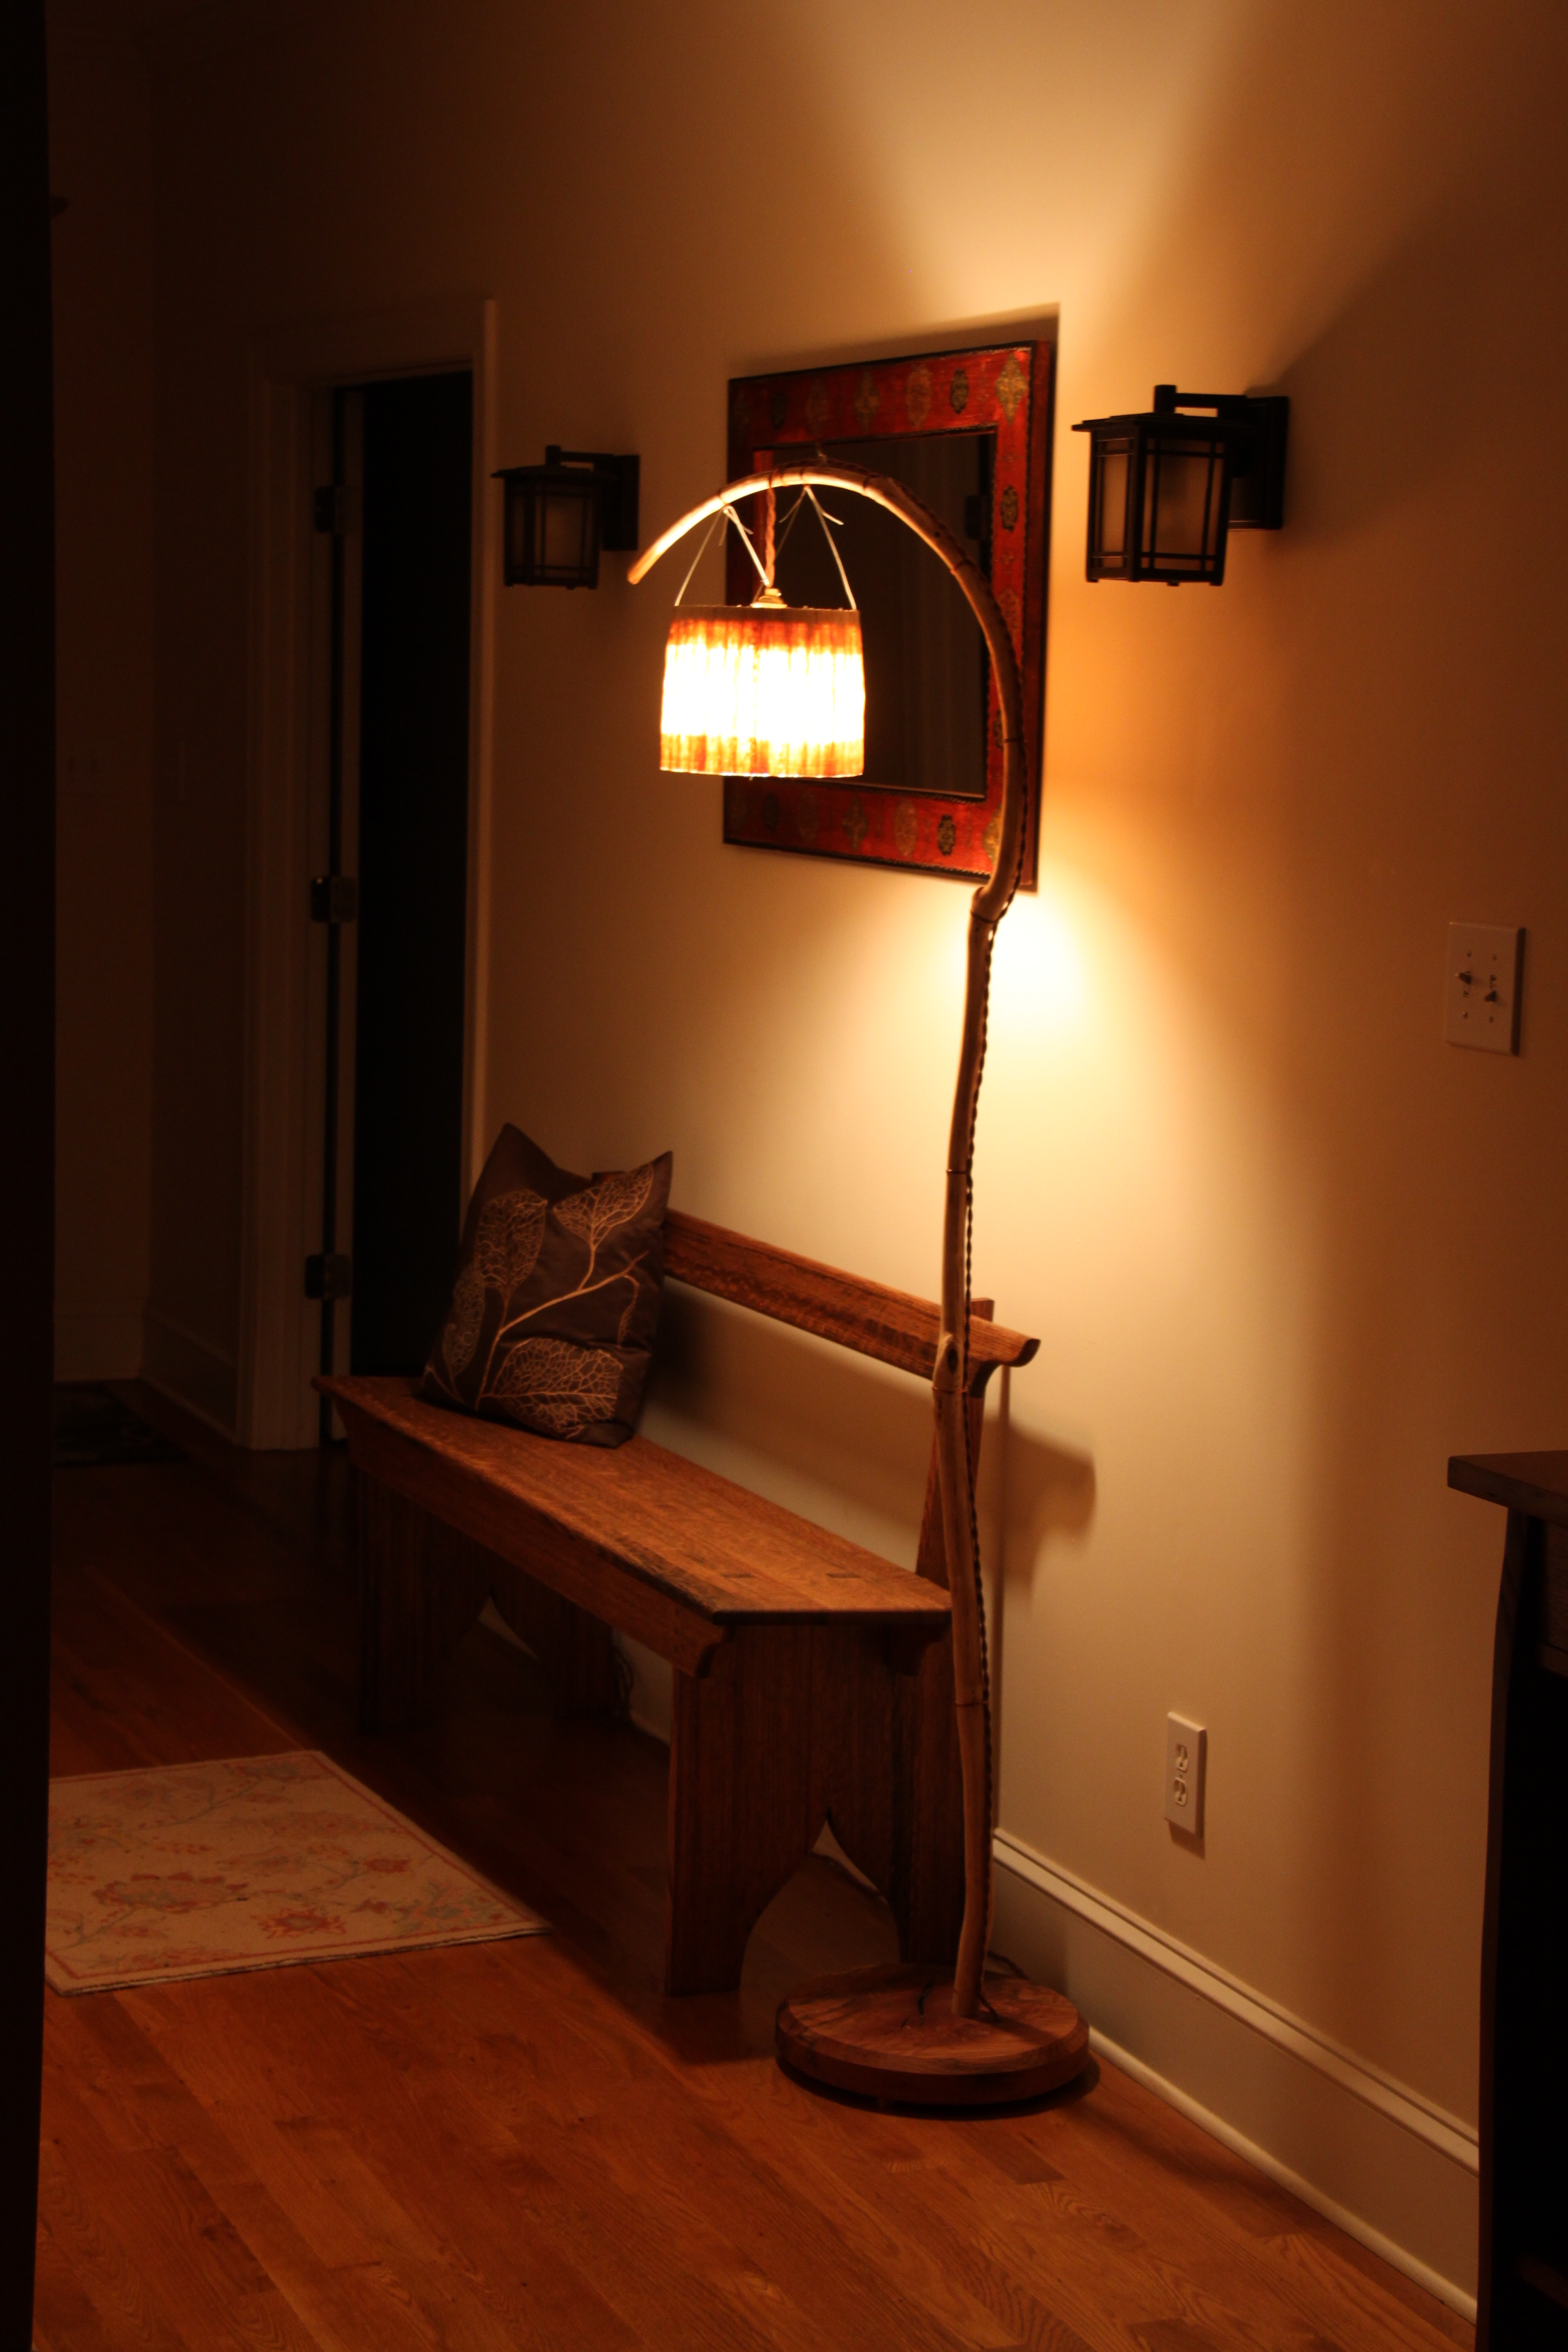 lamps lamp table etsy website floor horizontal img dark column